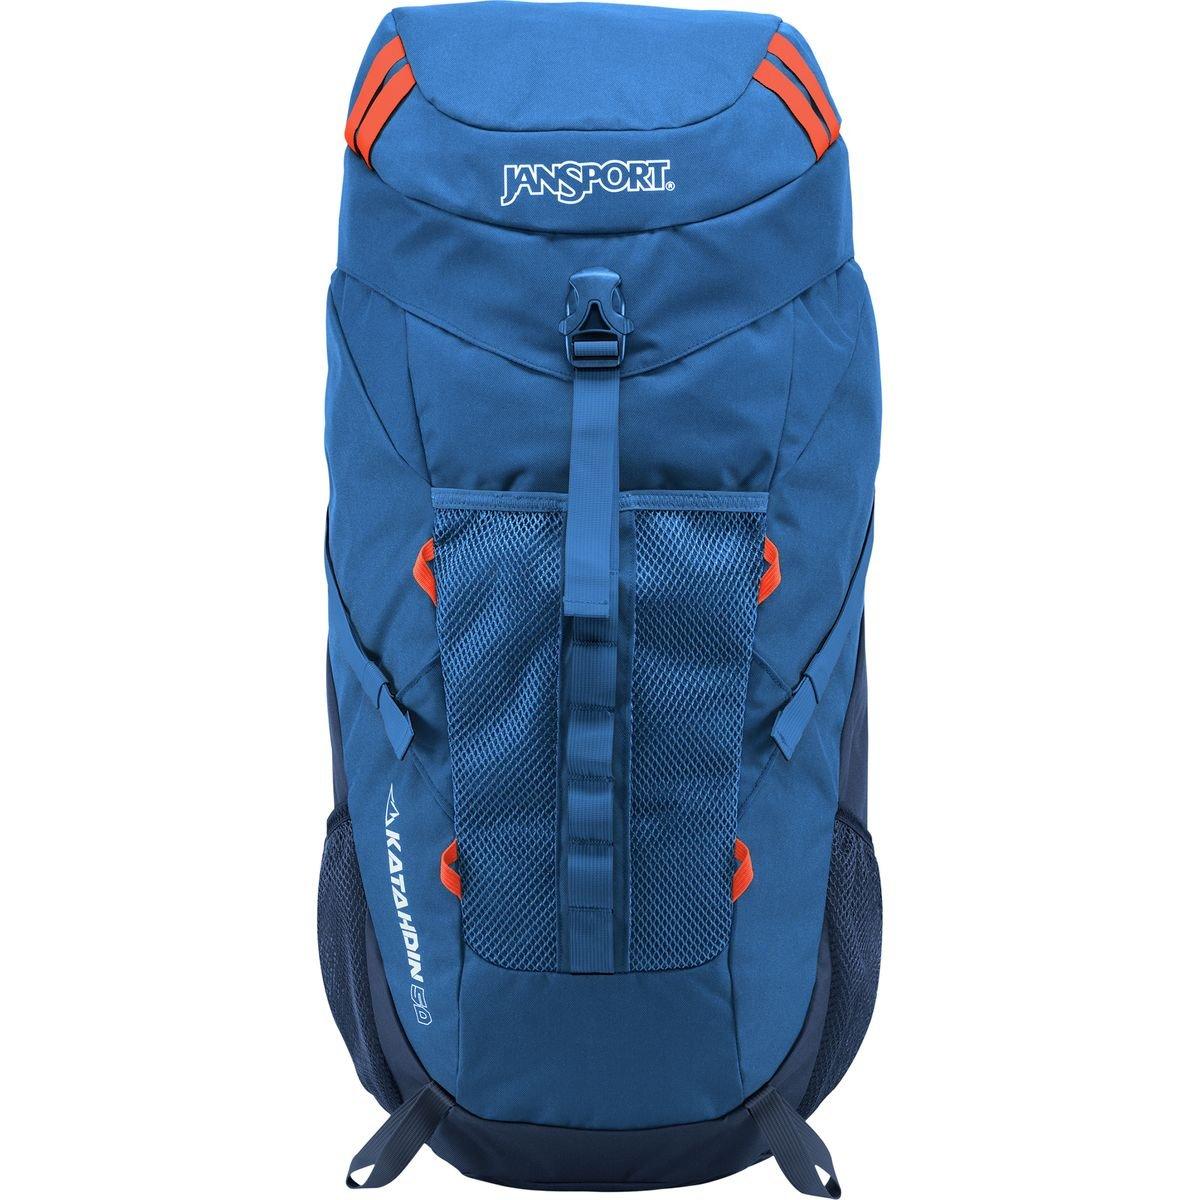 Amazon.com: JanSport Katahdin 50 Backpack, Midnightsky/Navymoonshine ...